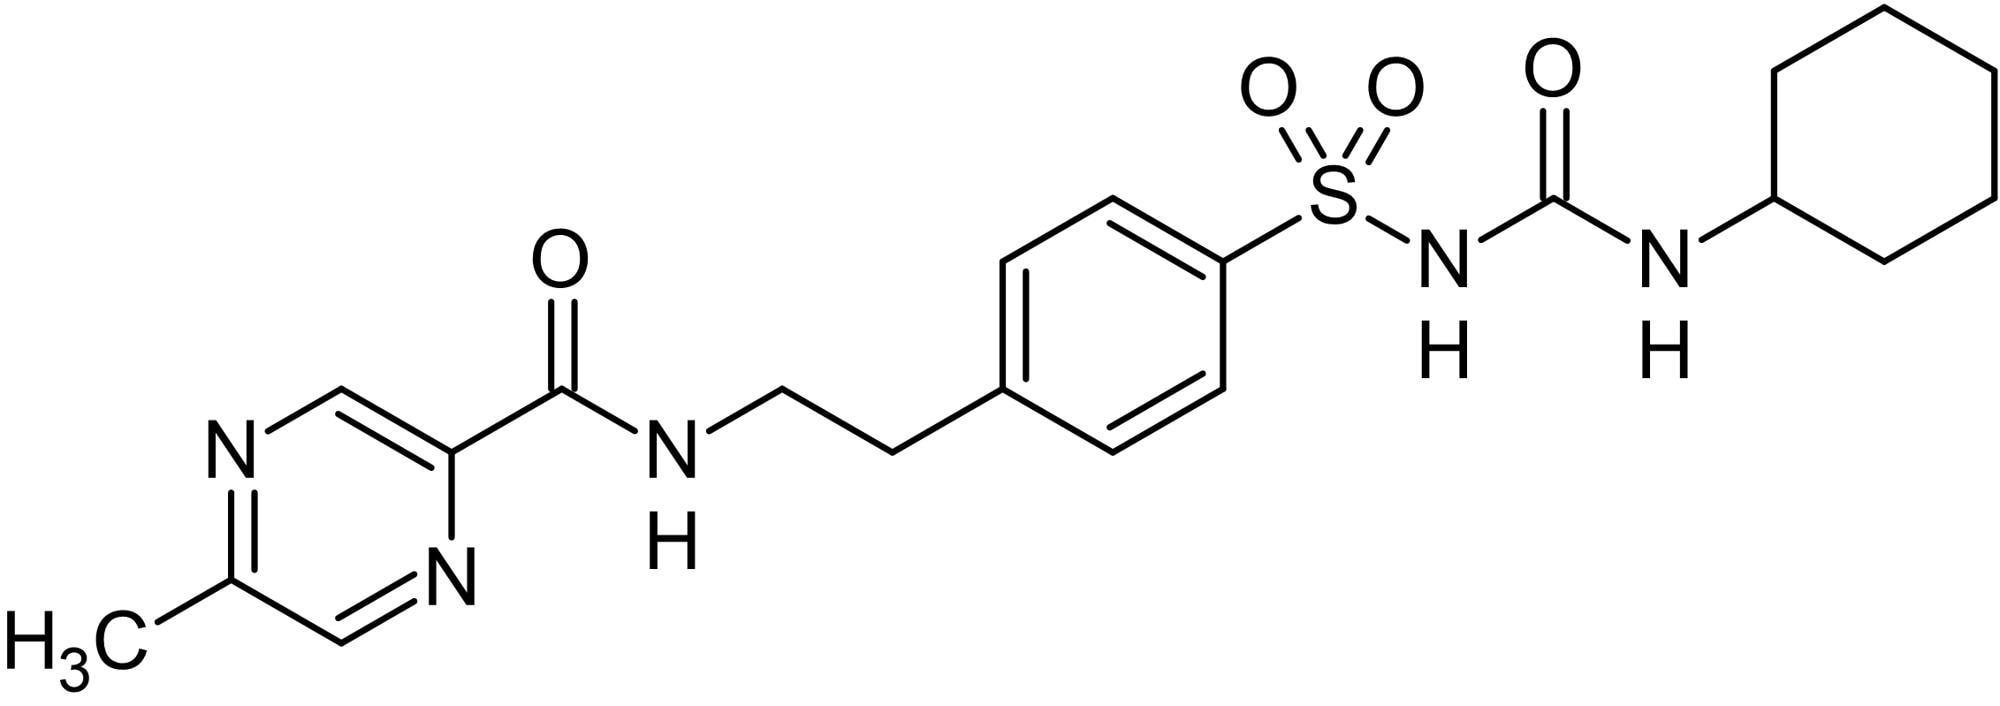 Chemical Structure - Glipizide, Sulfonylurea receptor (ab142302)